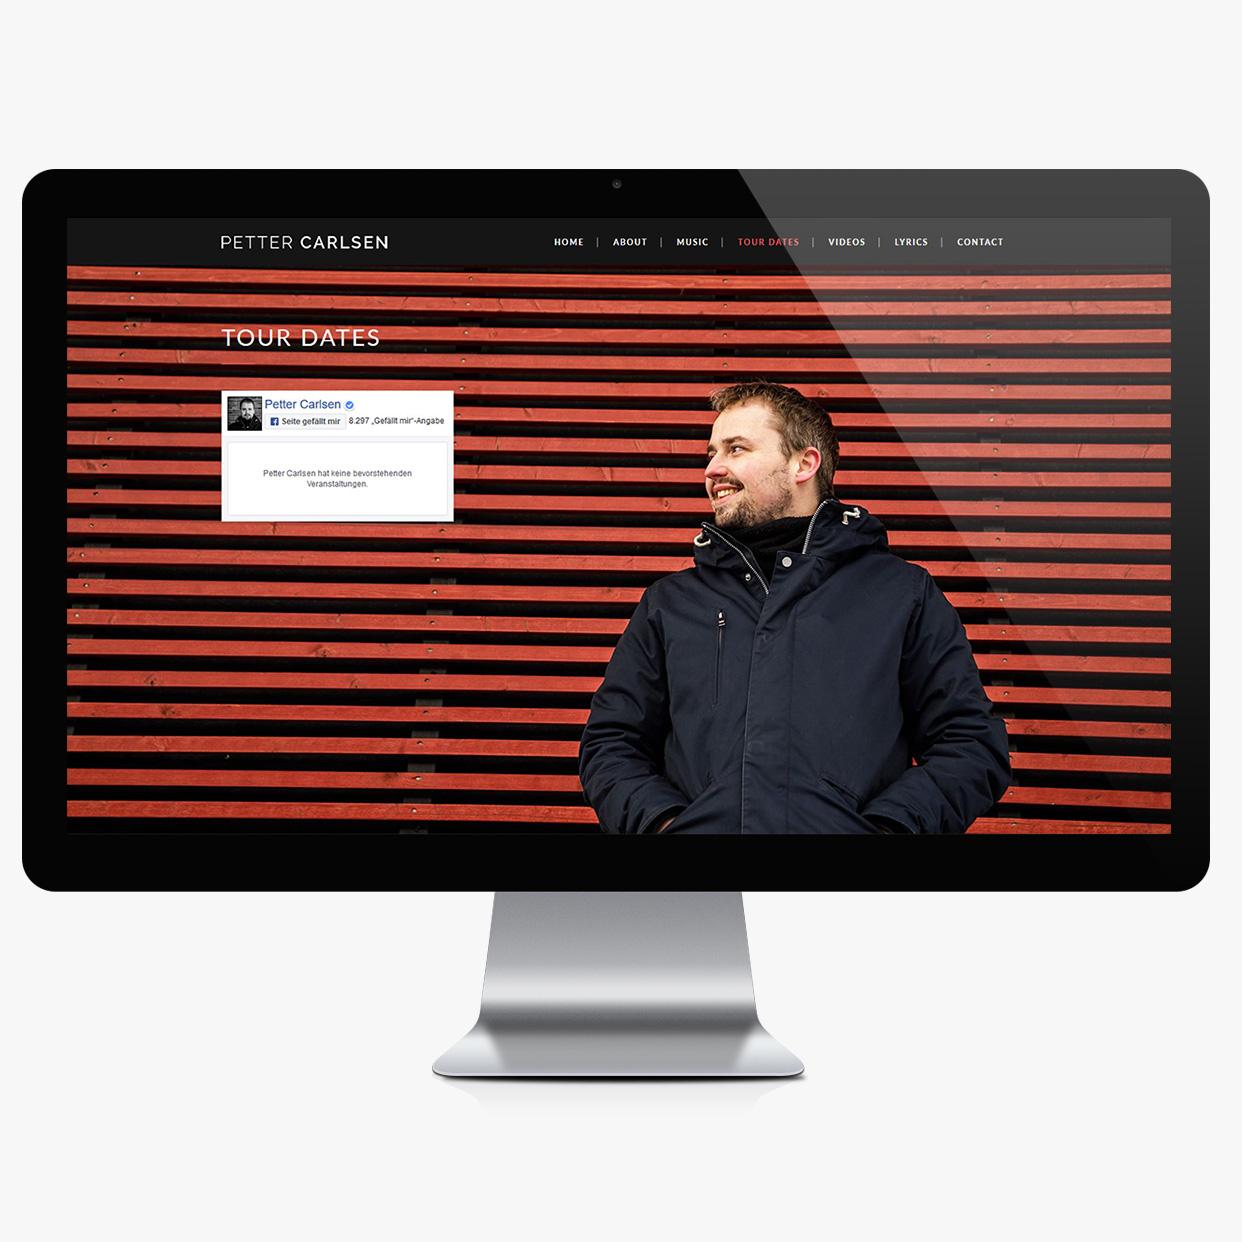 petter-carlsen-web-tour-dates